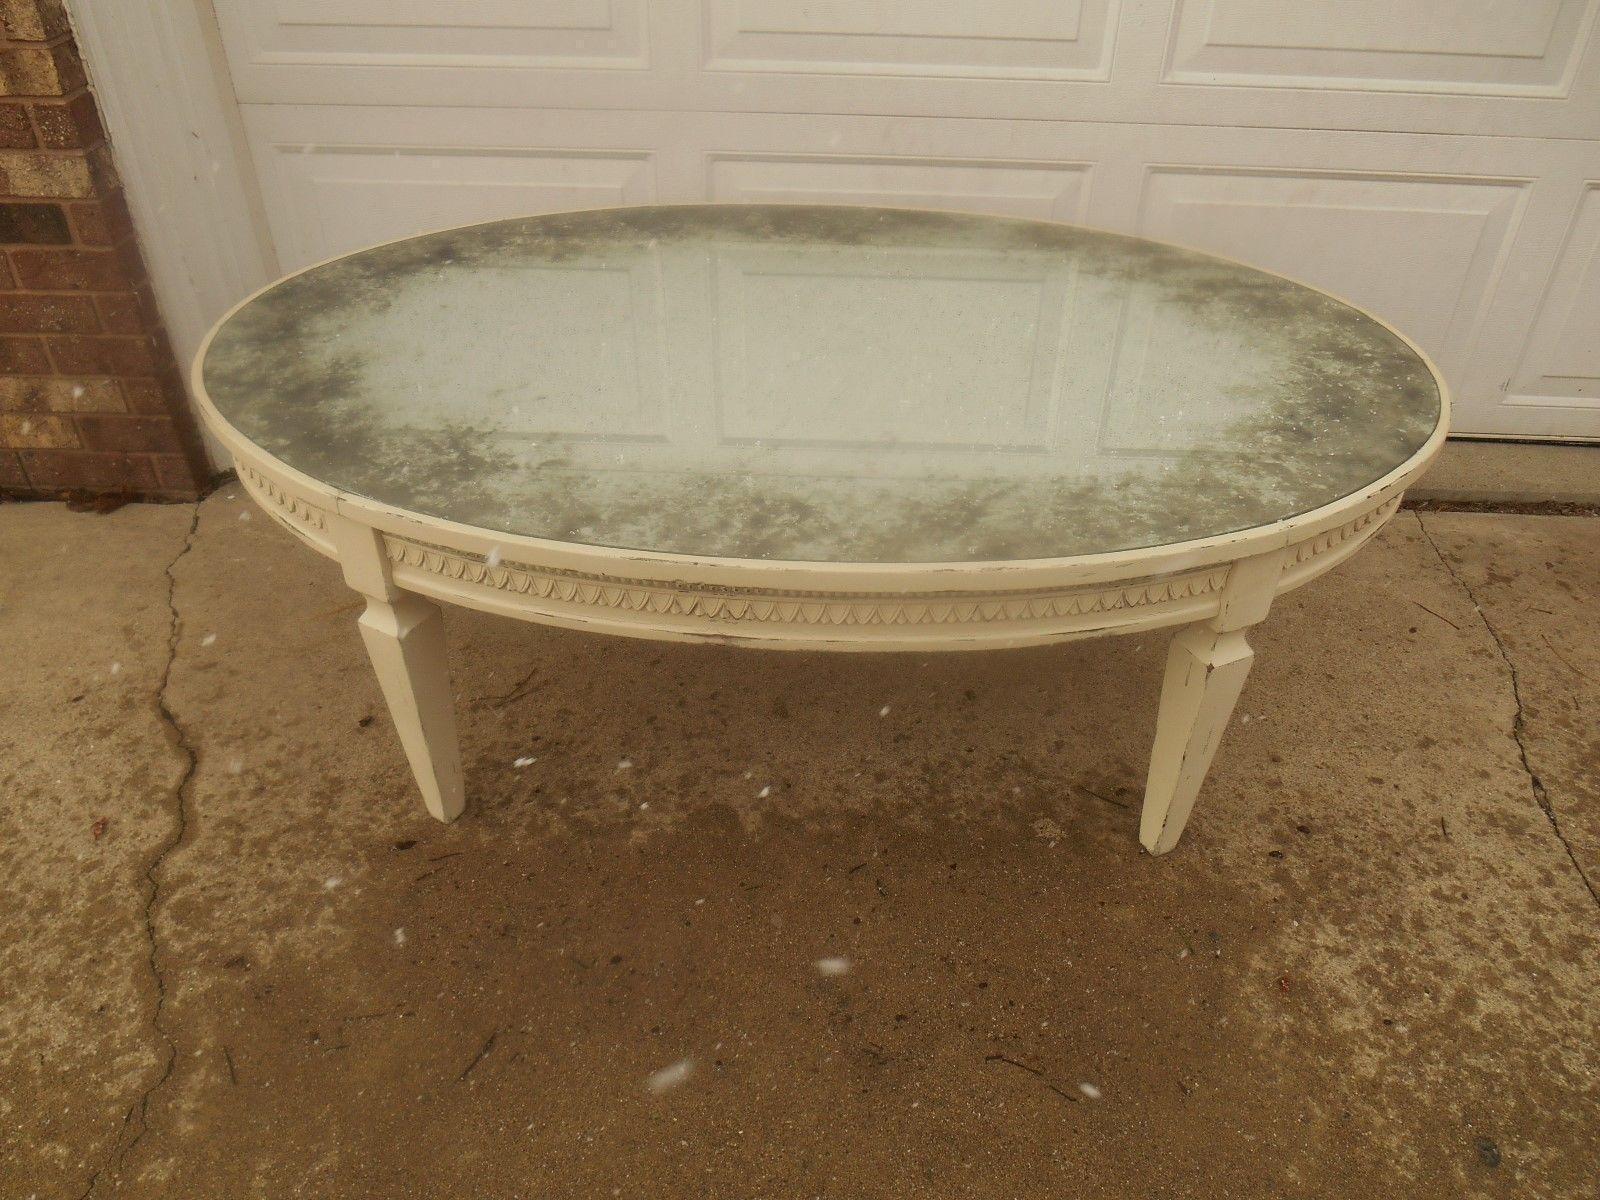 Arhaus Amelia Oval Antiqued Mirrored Top Cream Coffee Table Chairish